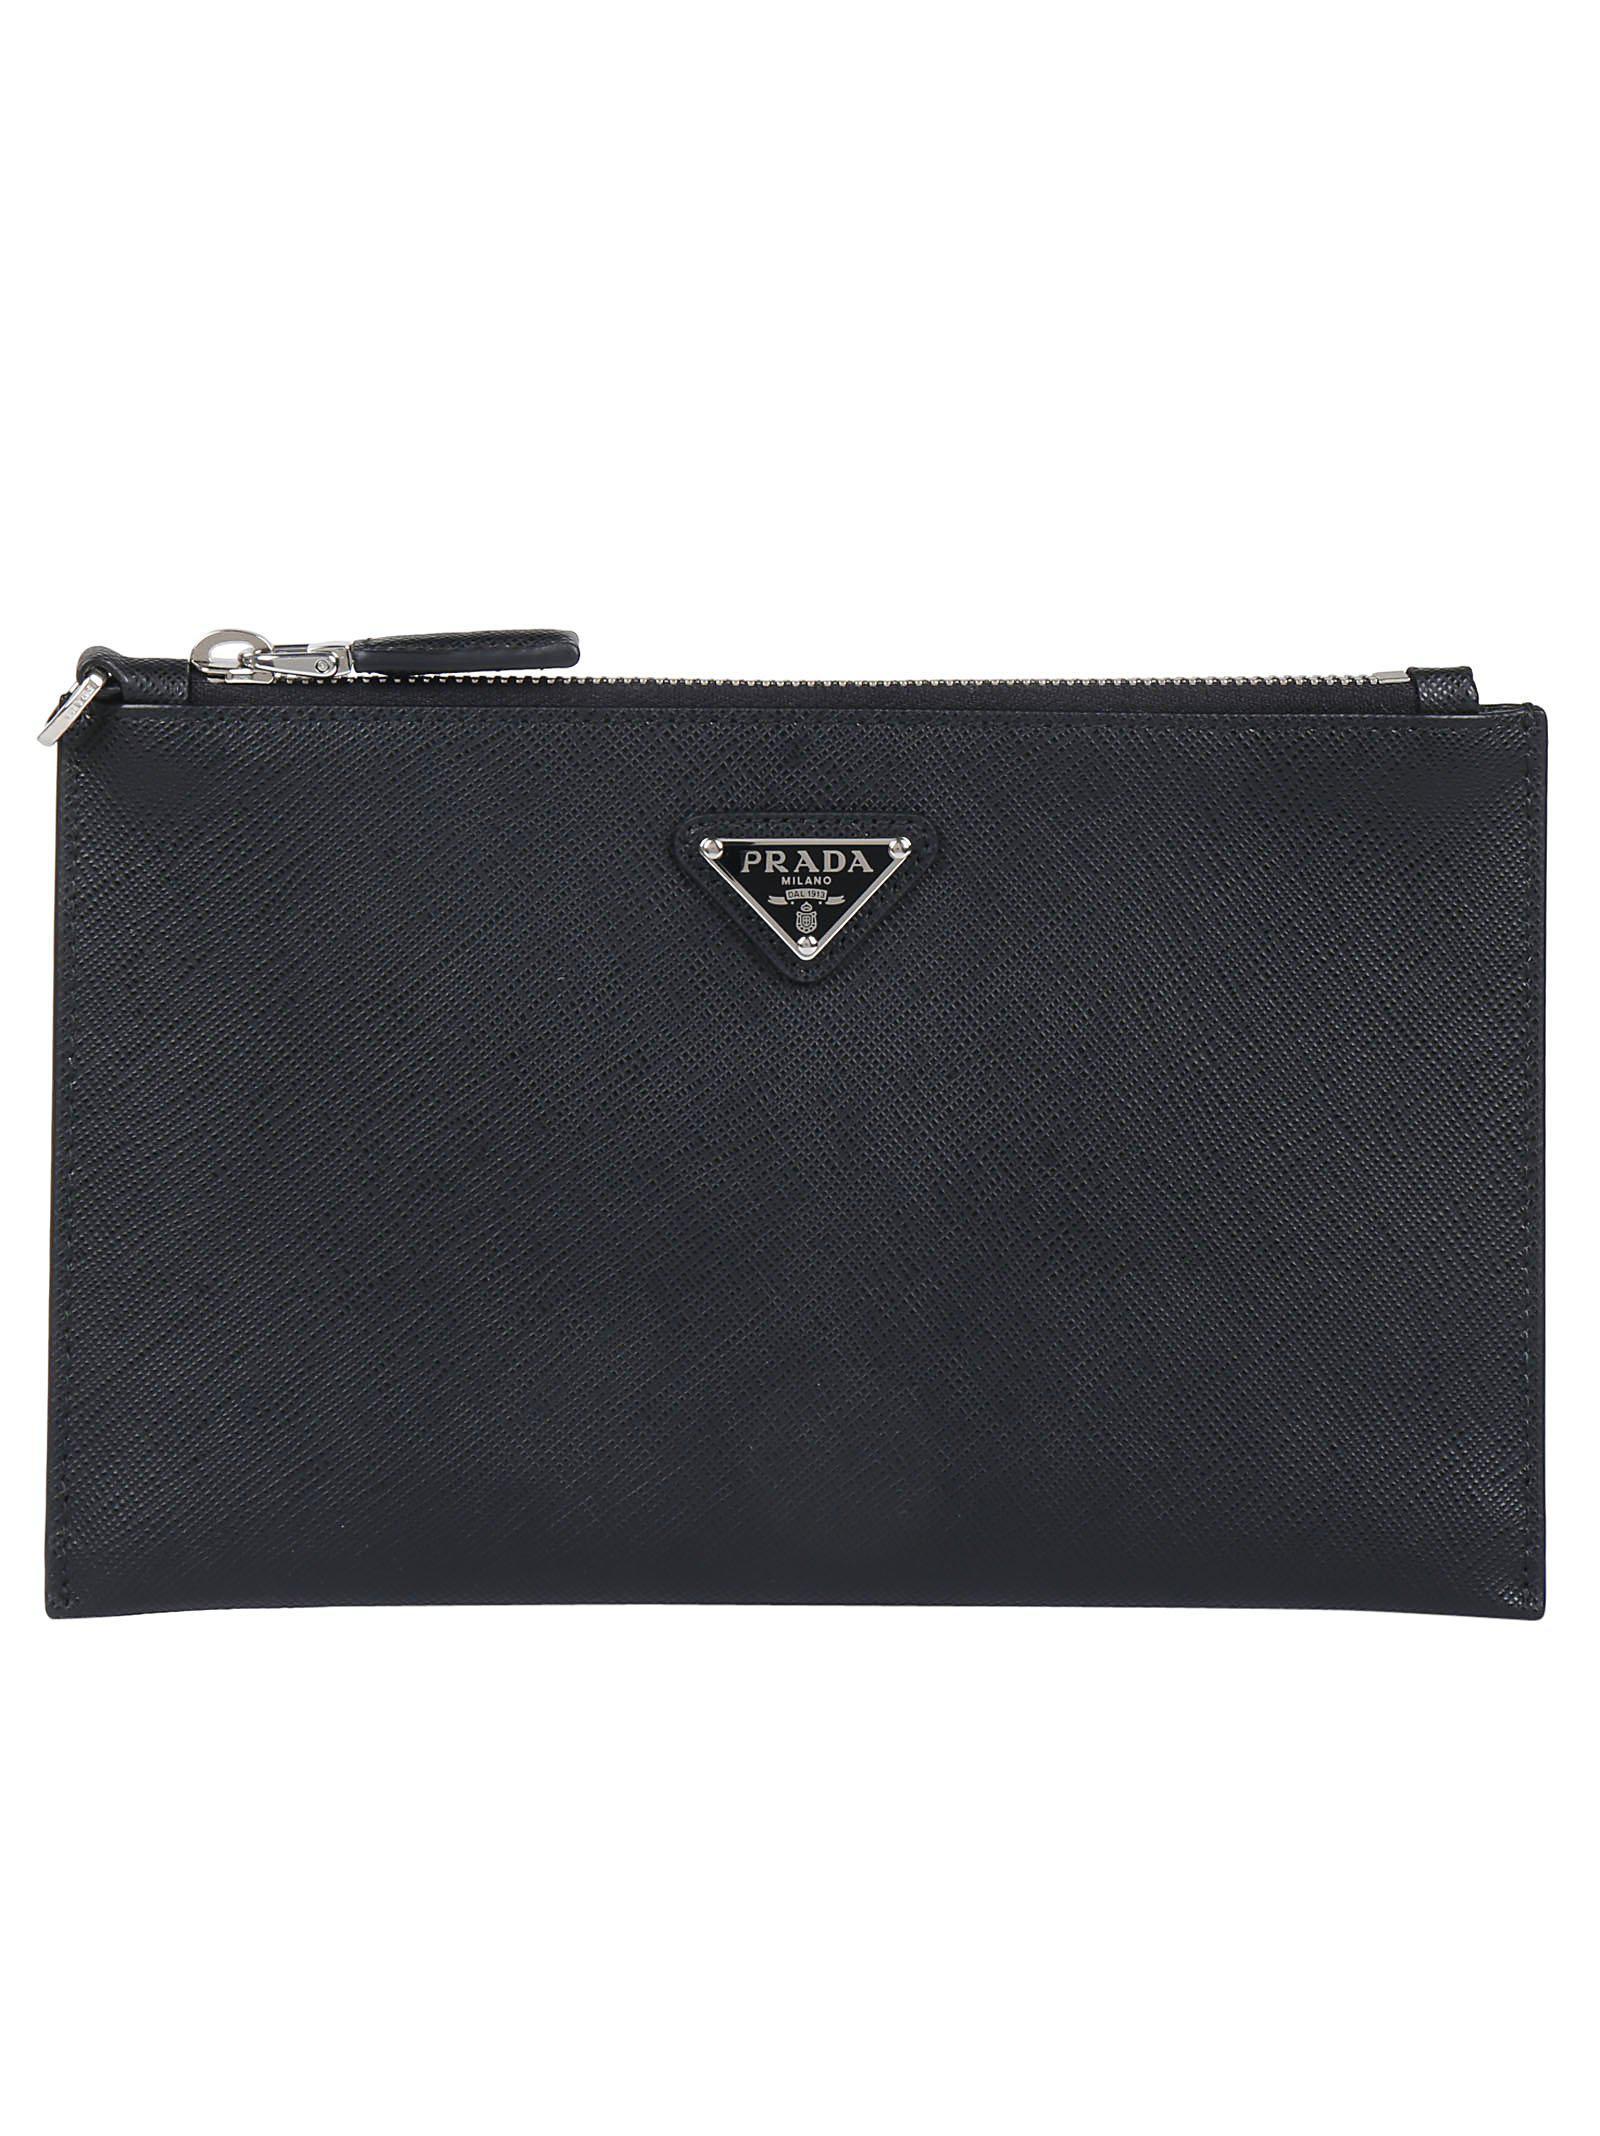 a305a589c56a Prada - Black Leather Logo Pouch - Lyst. View fullscreen